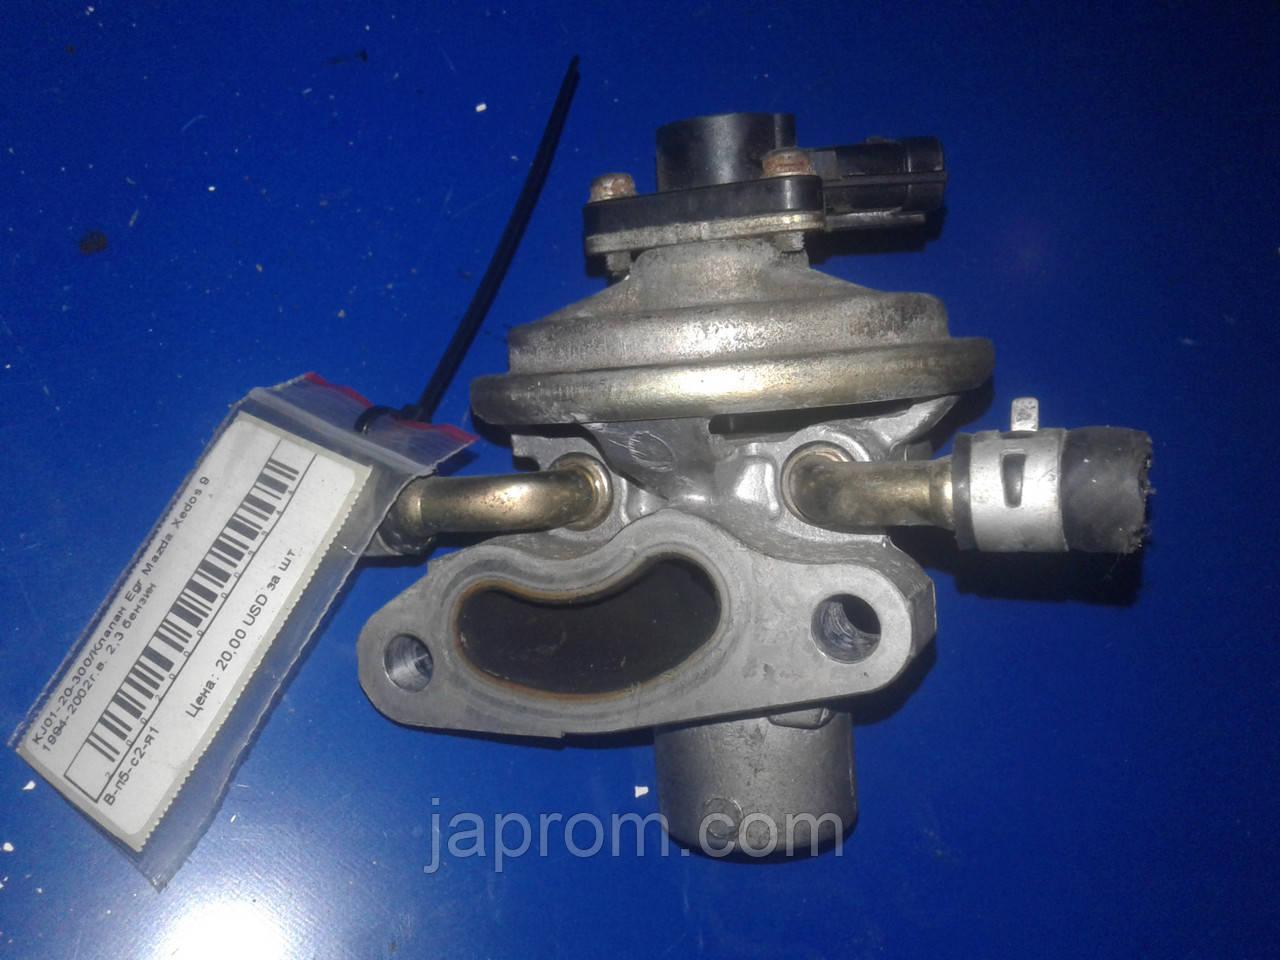 Клапан Egr Mazda Xedos 9 1994-2002г.в. 2,3 бензин